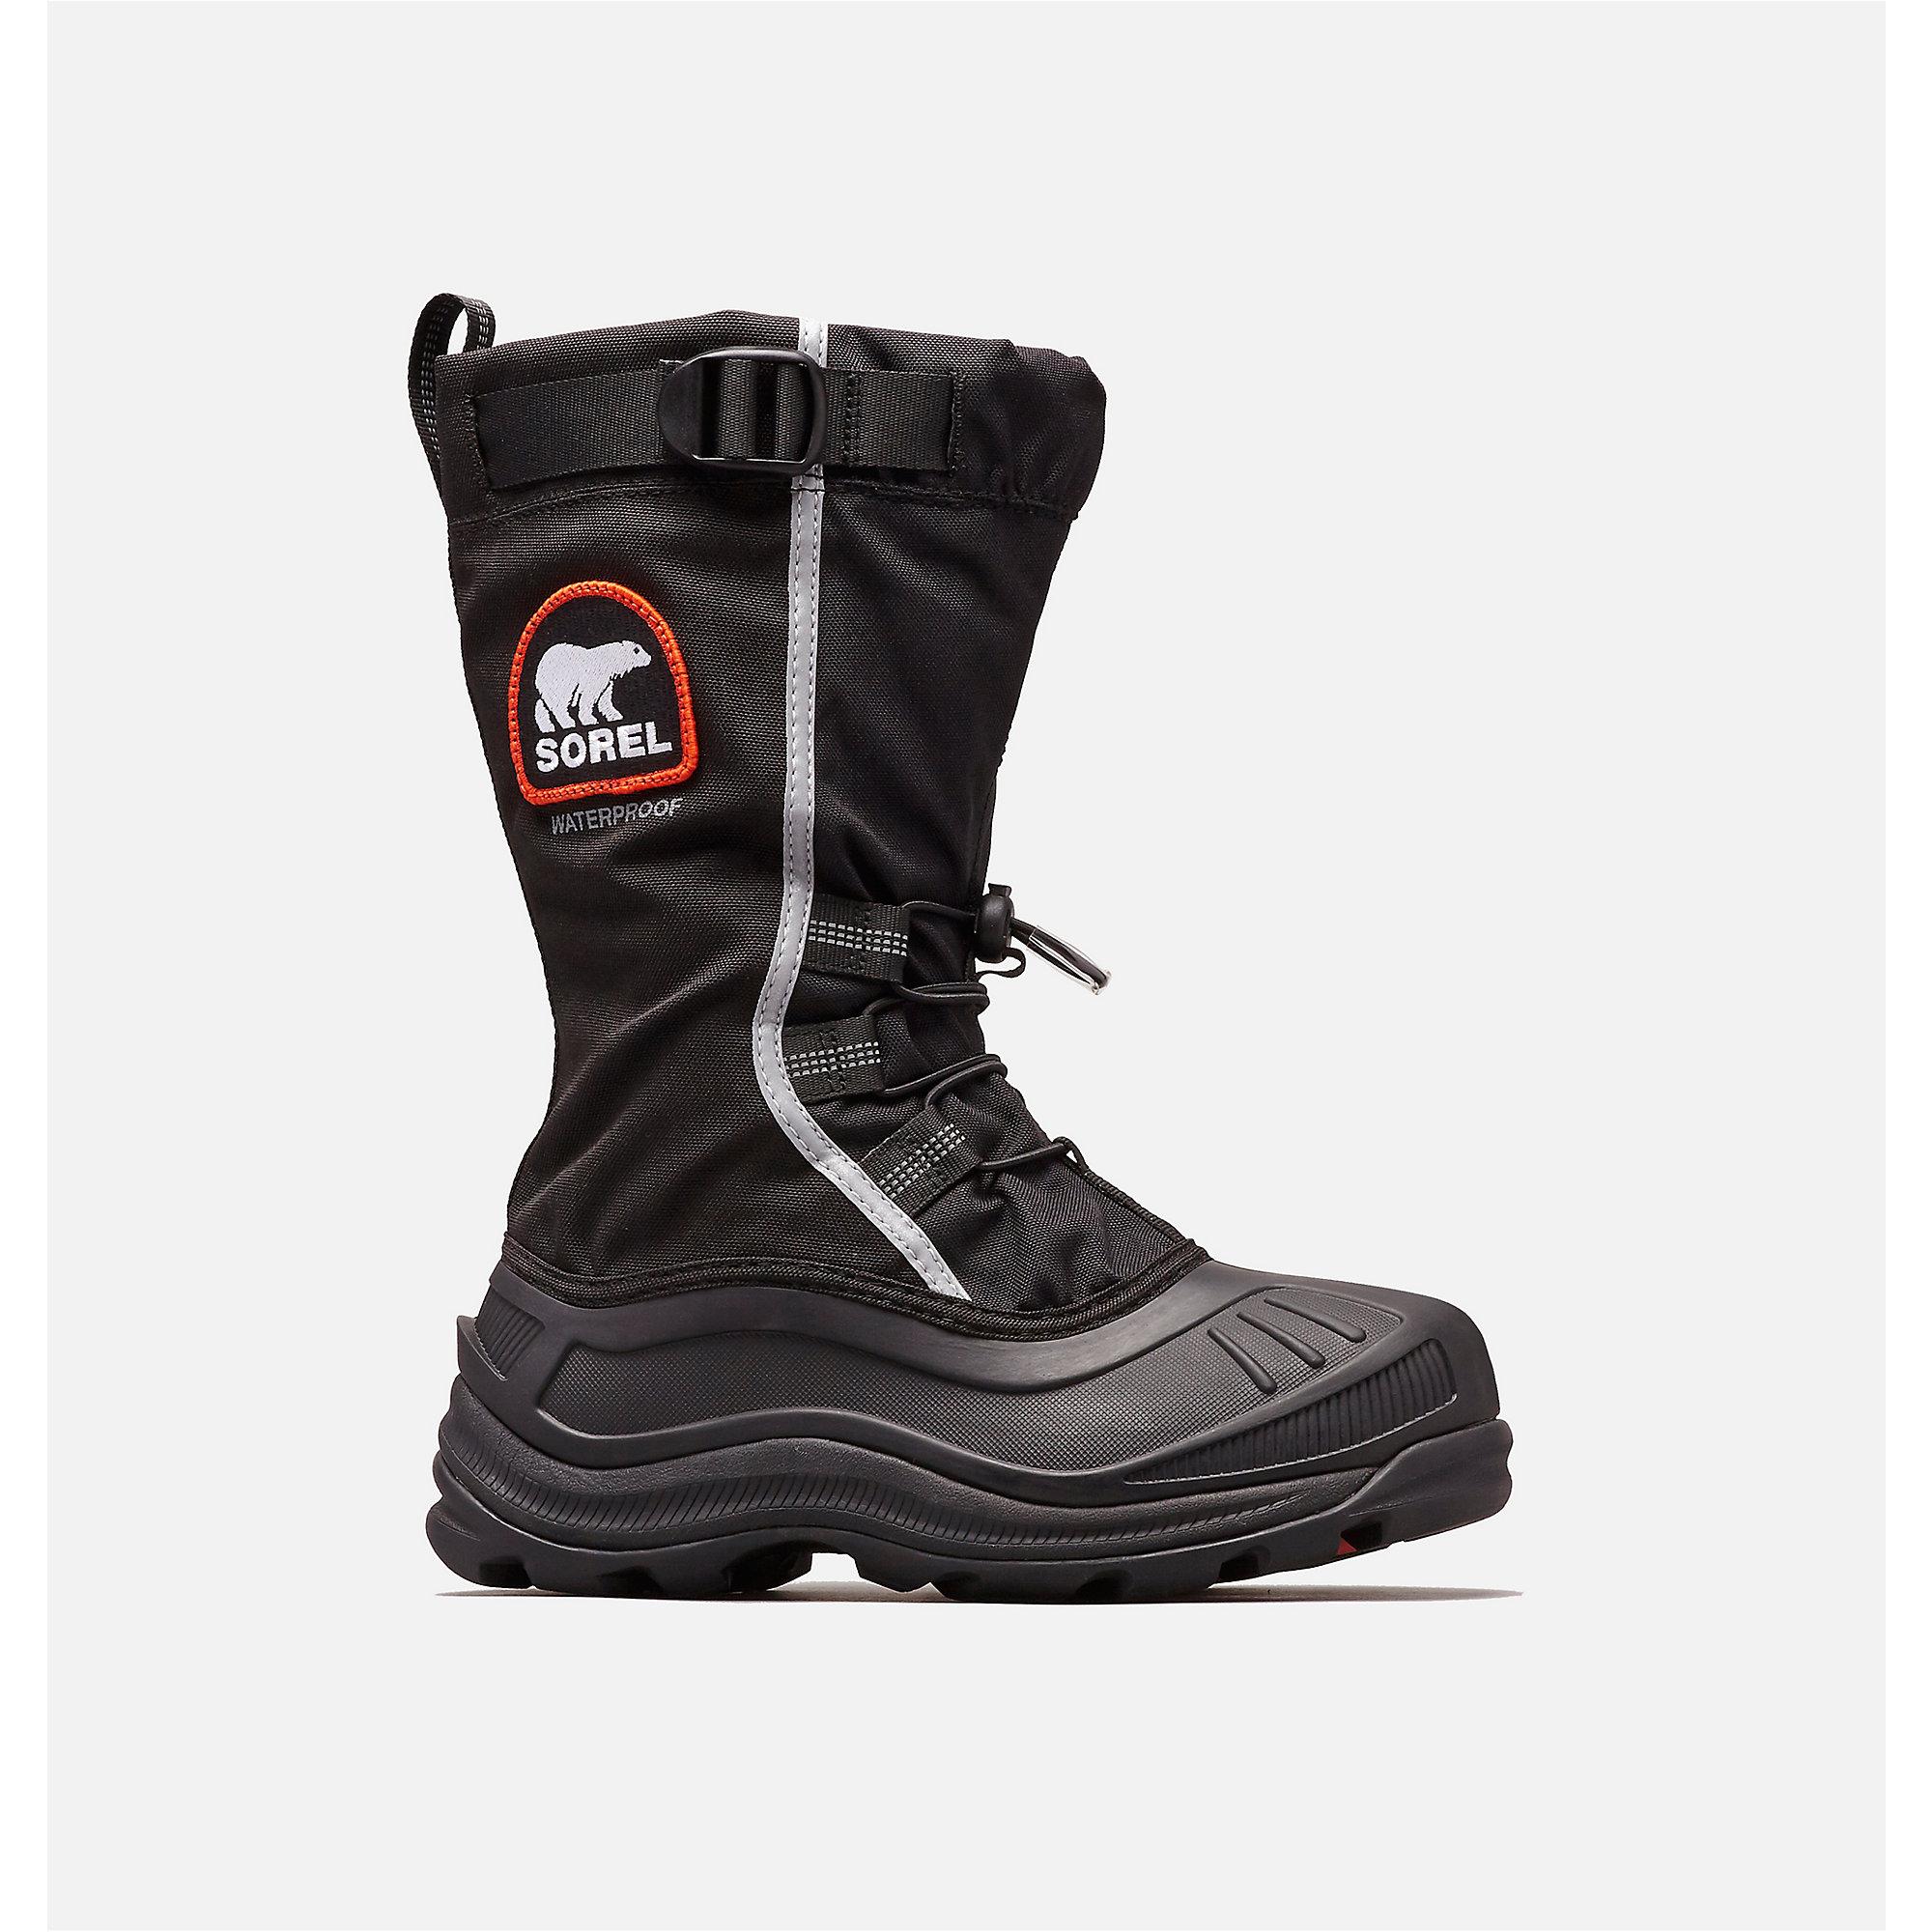 5e2743db6f1a0 SOREL Women s Alpha Pac XT Boot Size 12 - Black Red Quartz